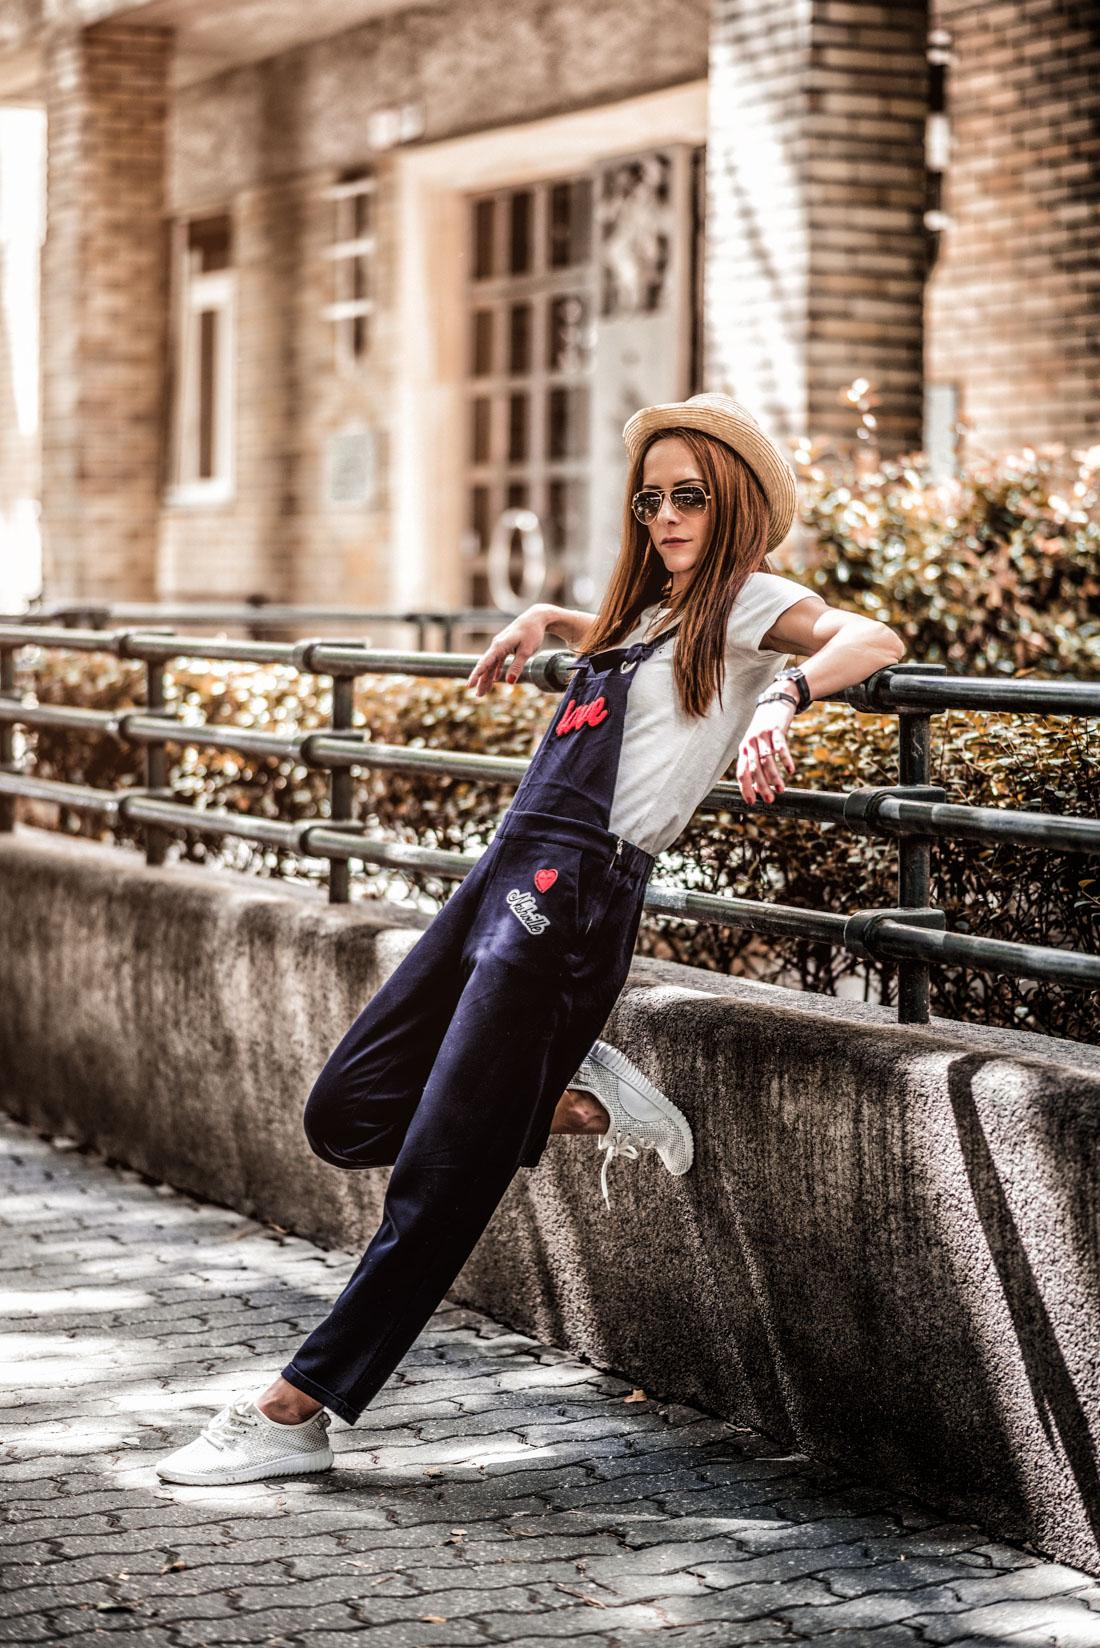 PÁNSKE DOPLNKY OD SLOVENSKEJ ZNAČKY_Katharine-fashion is beautiful_blog 3_pánske doplnky Shperka_Katarína Jakuibčová_Fashion blogerka